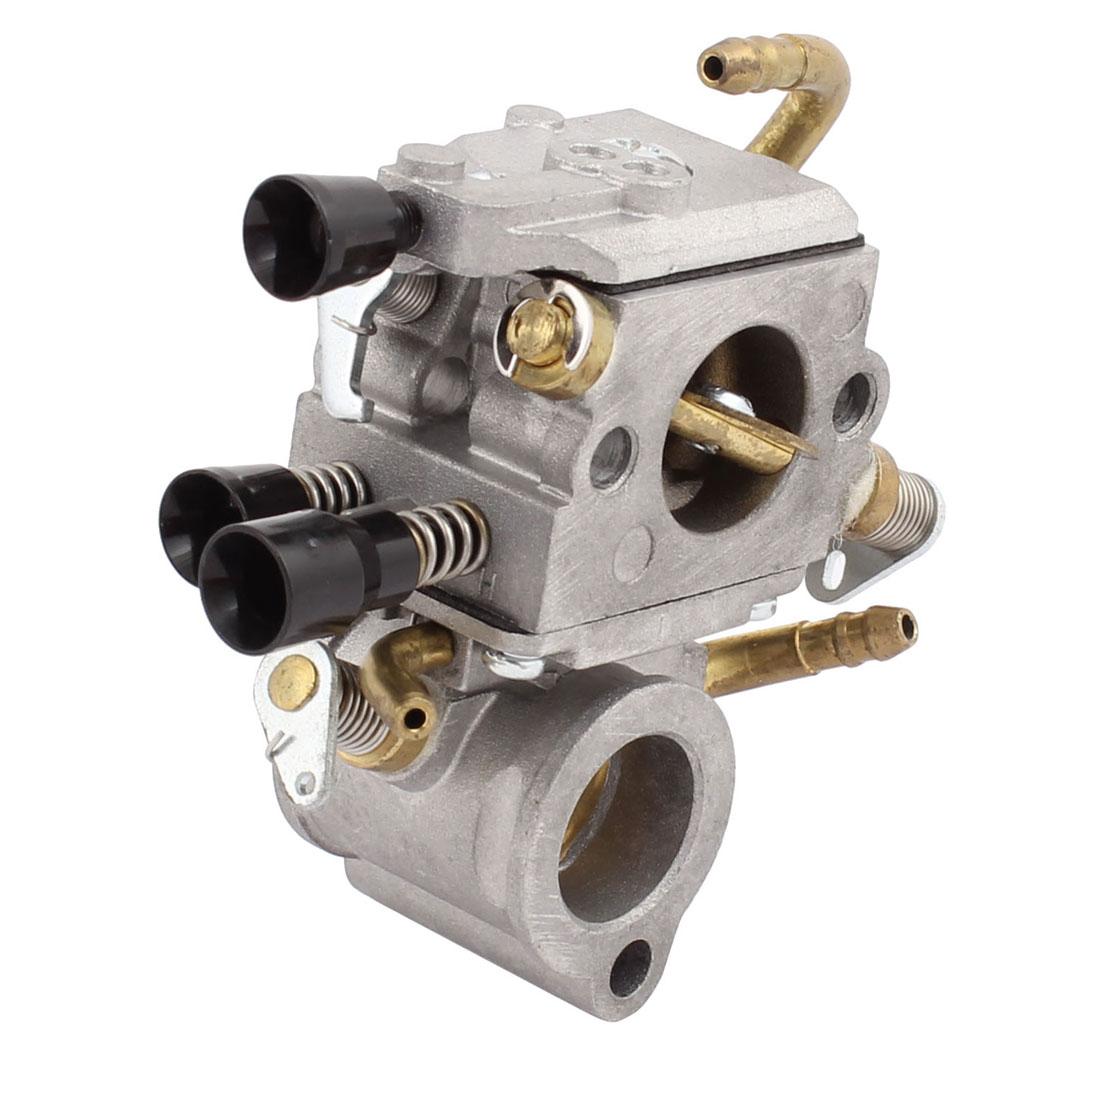 New Carburetor for Stihl Chainsaw Parts Lawn Mower TS410 TS420 Carburador Carb